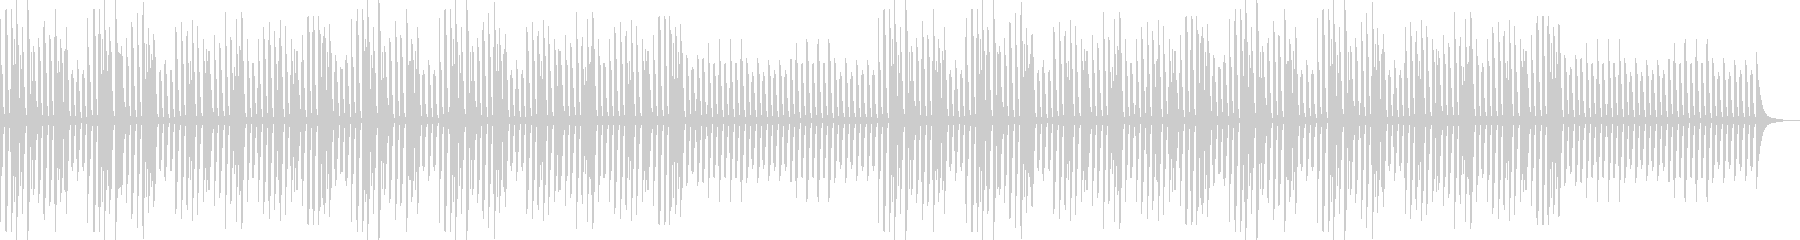 YouTube・日常・ほのぼのピアノソロの未再生の波形